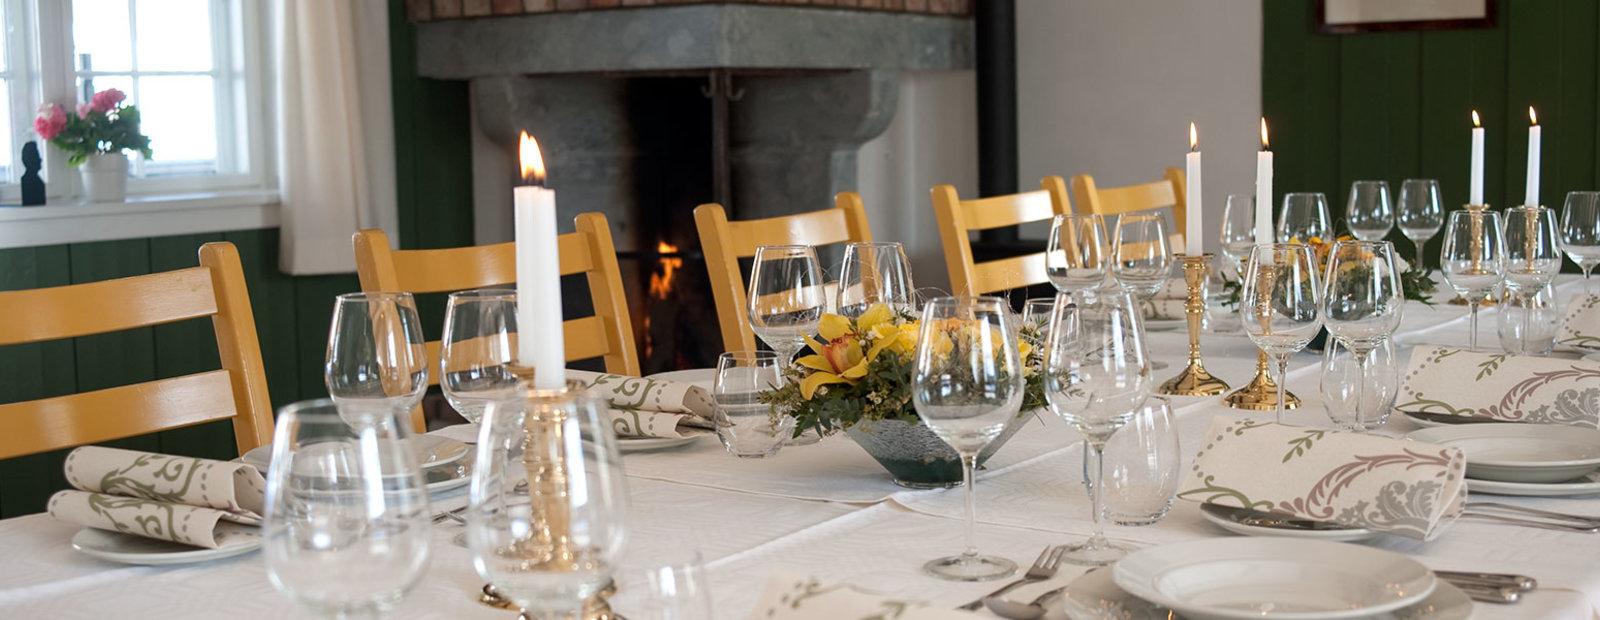 Dekket bord i Folkestua, Aulestad Bjørnstjerne Bjørnsons hjem